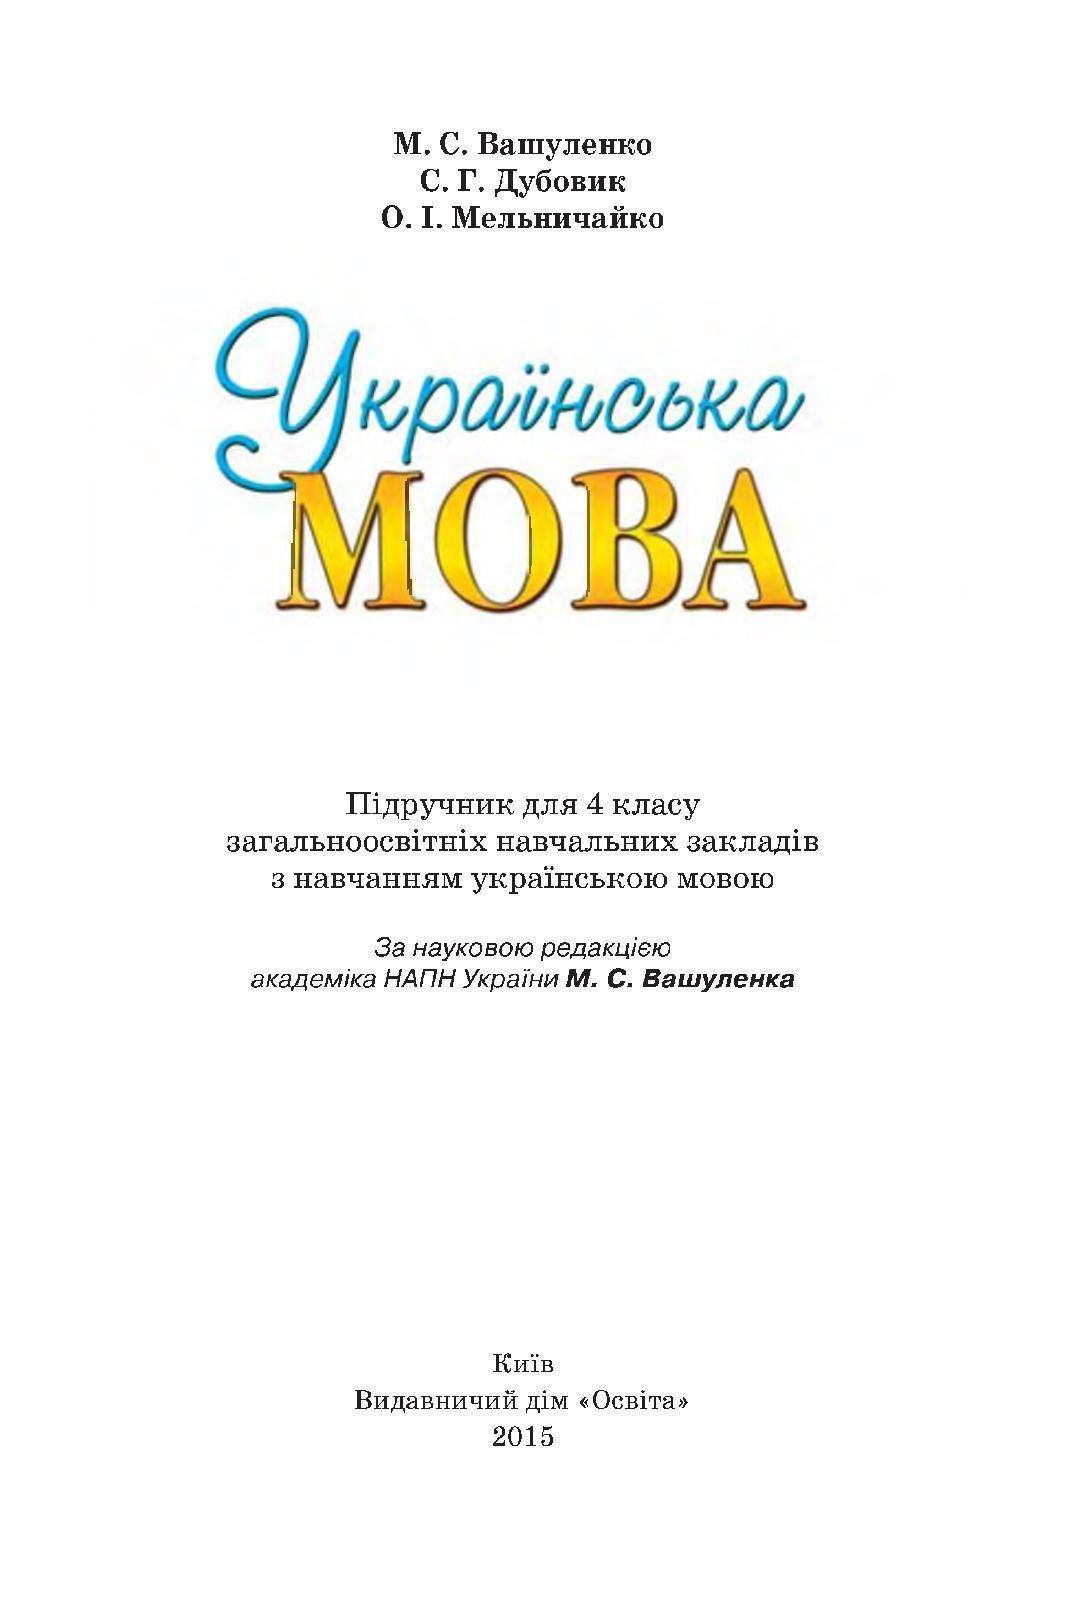 Calaméo - 4 клас. Українська мова (Вашуленко 7721c8f76fe74